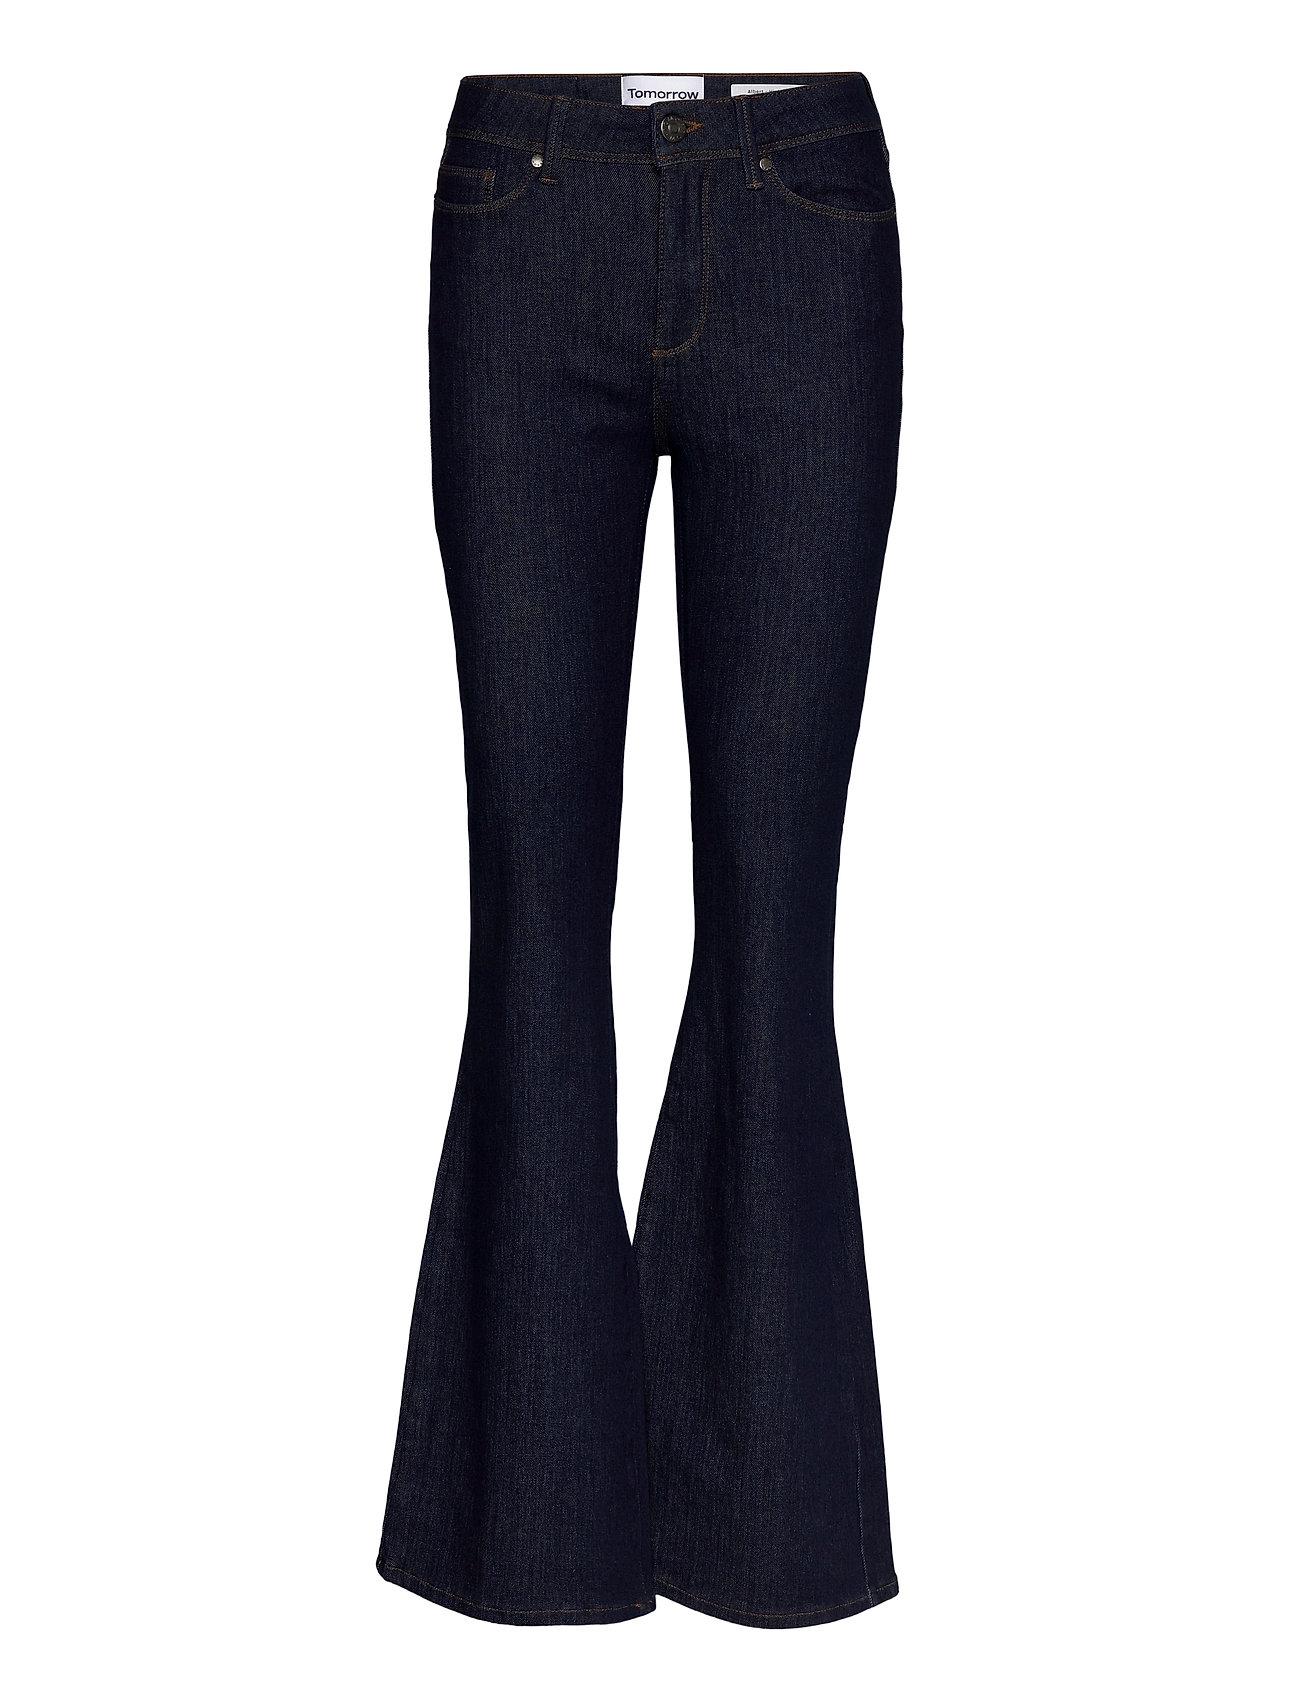 Tomorrow - Albert flare jeans Rinse - schlaghosen - denim blue - 0